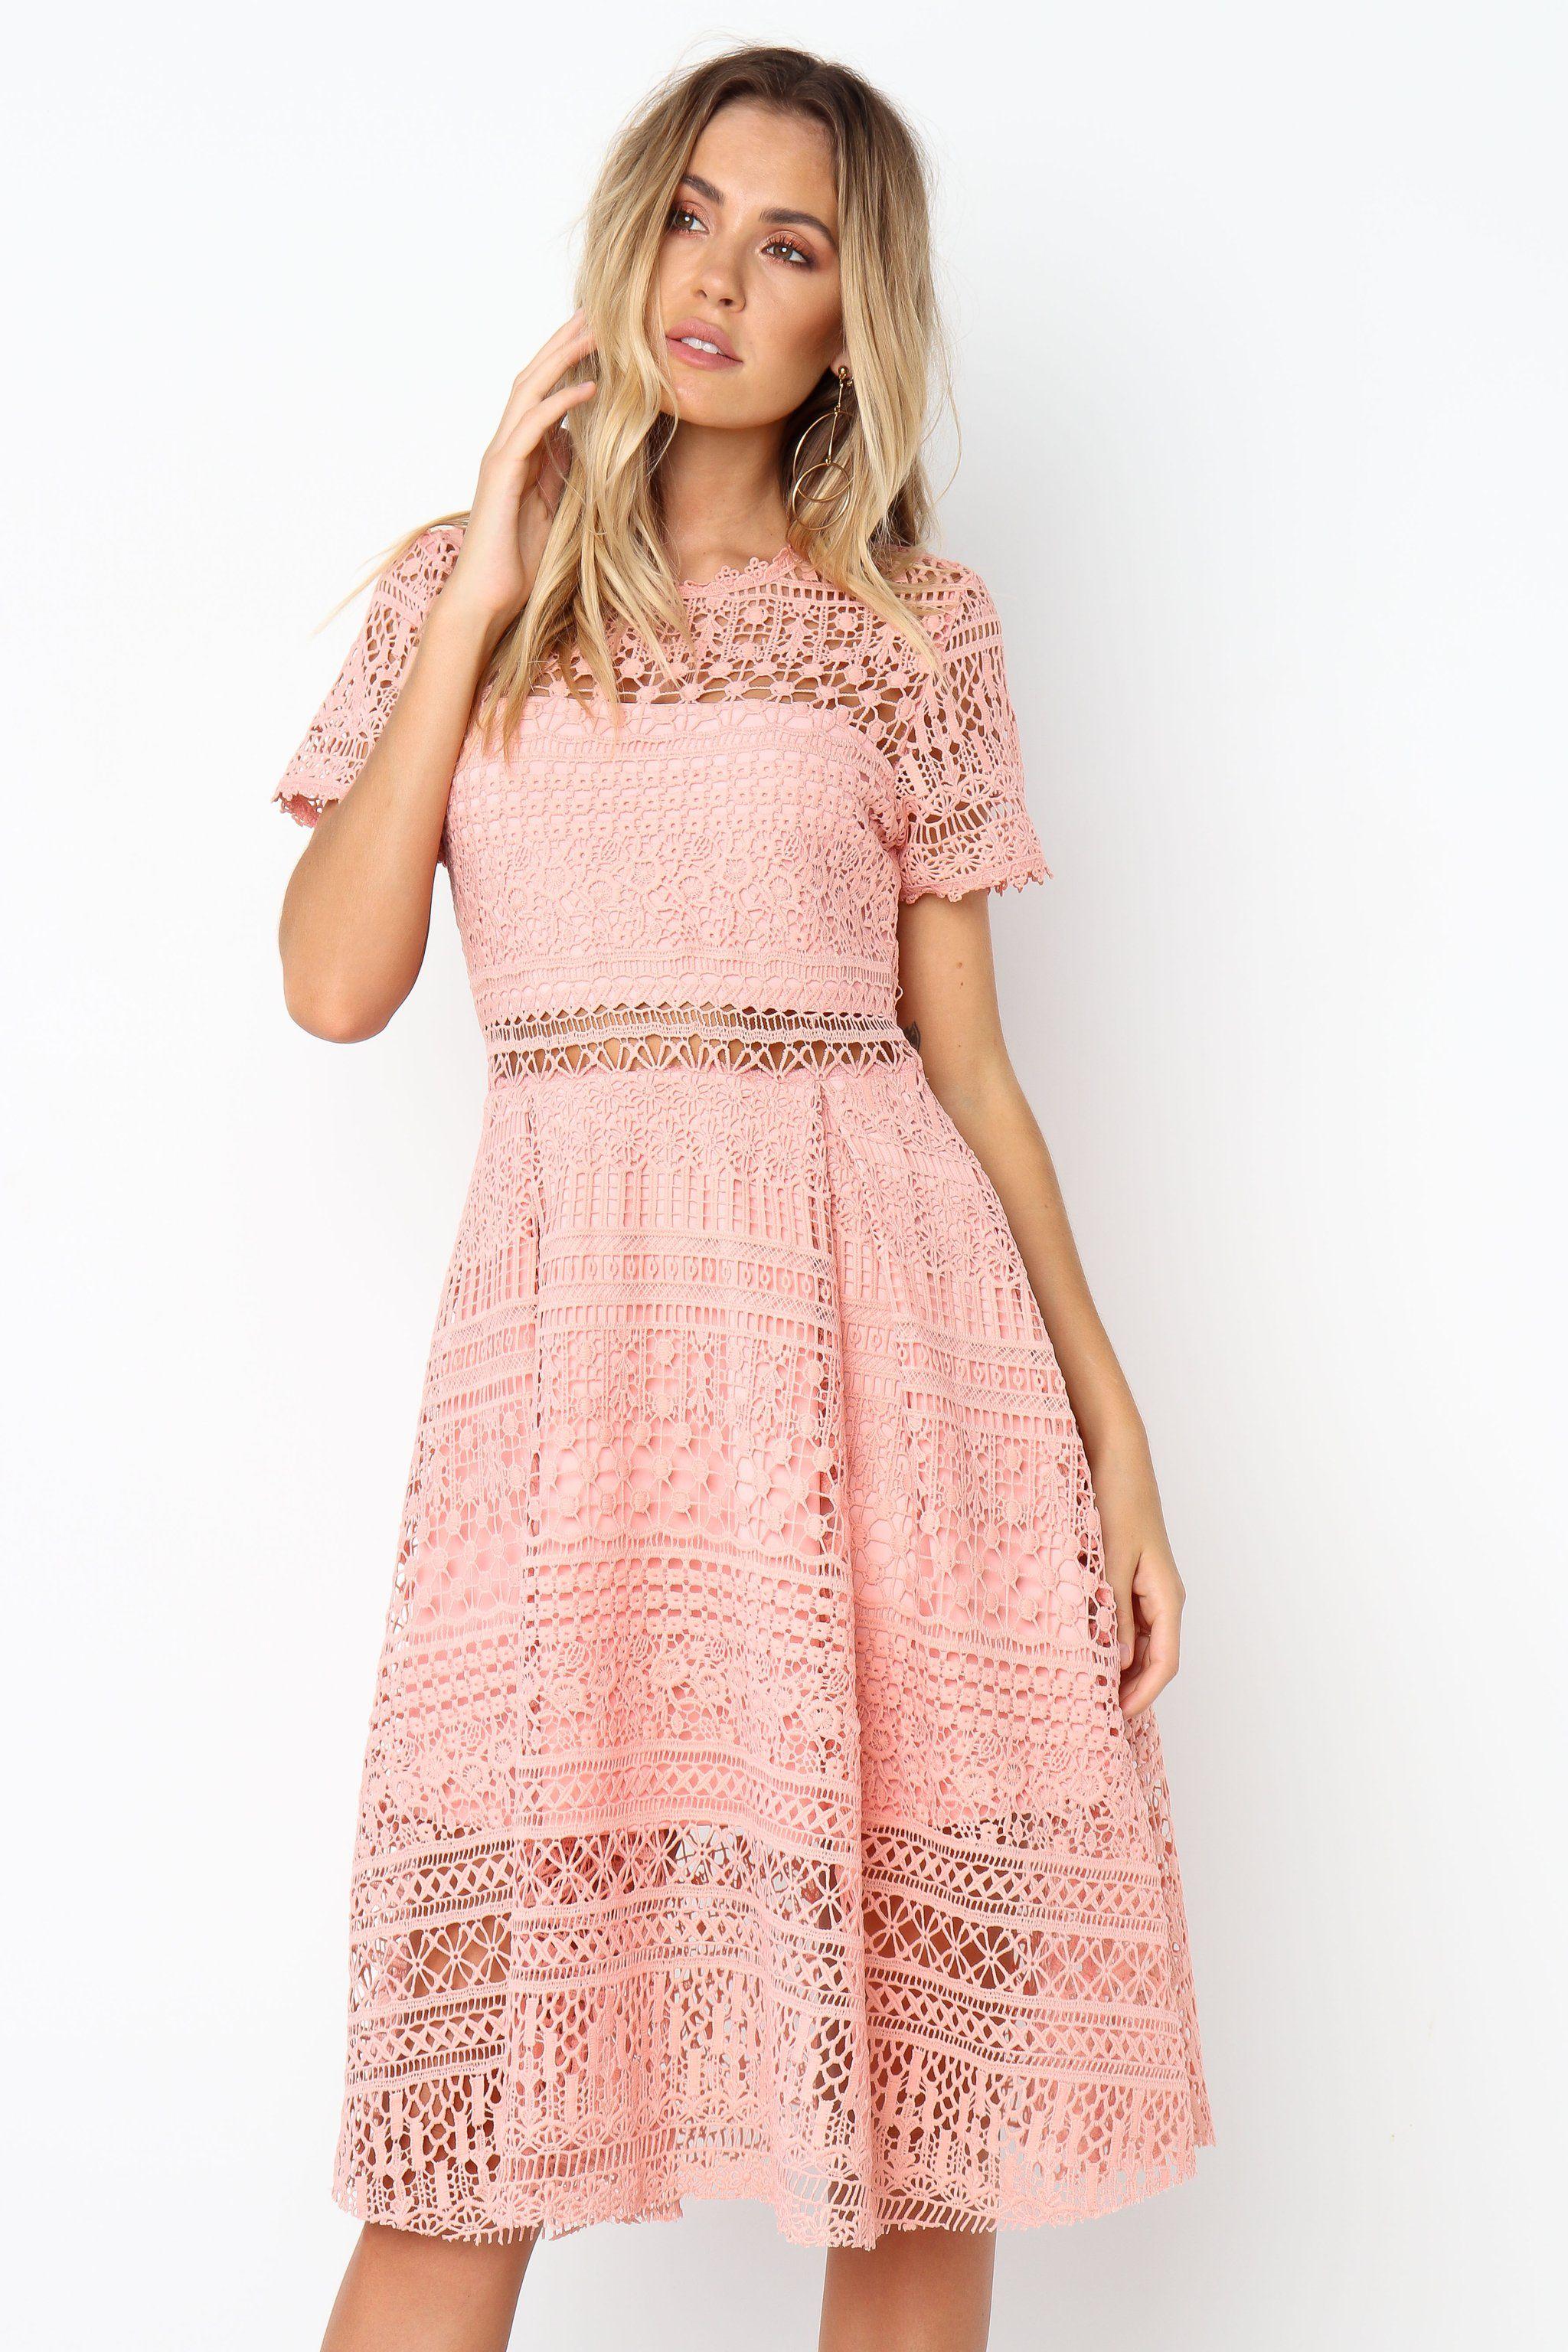 Ishana Dress - Blush | Fashion Wishlist | Pinterest